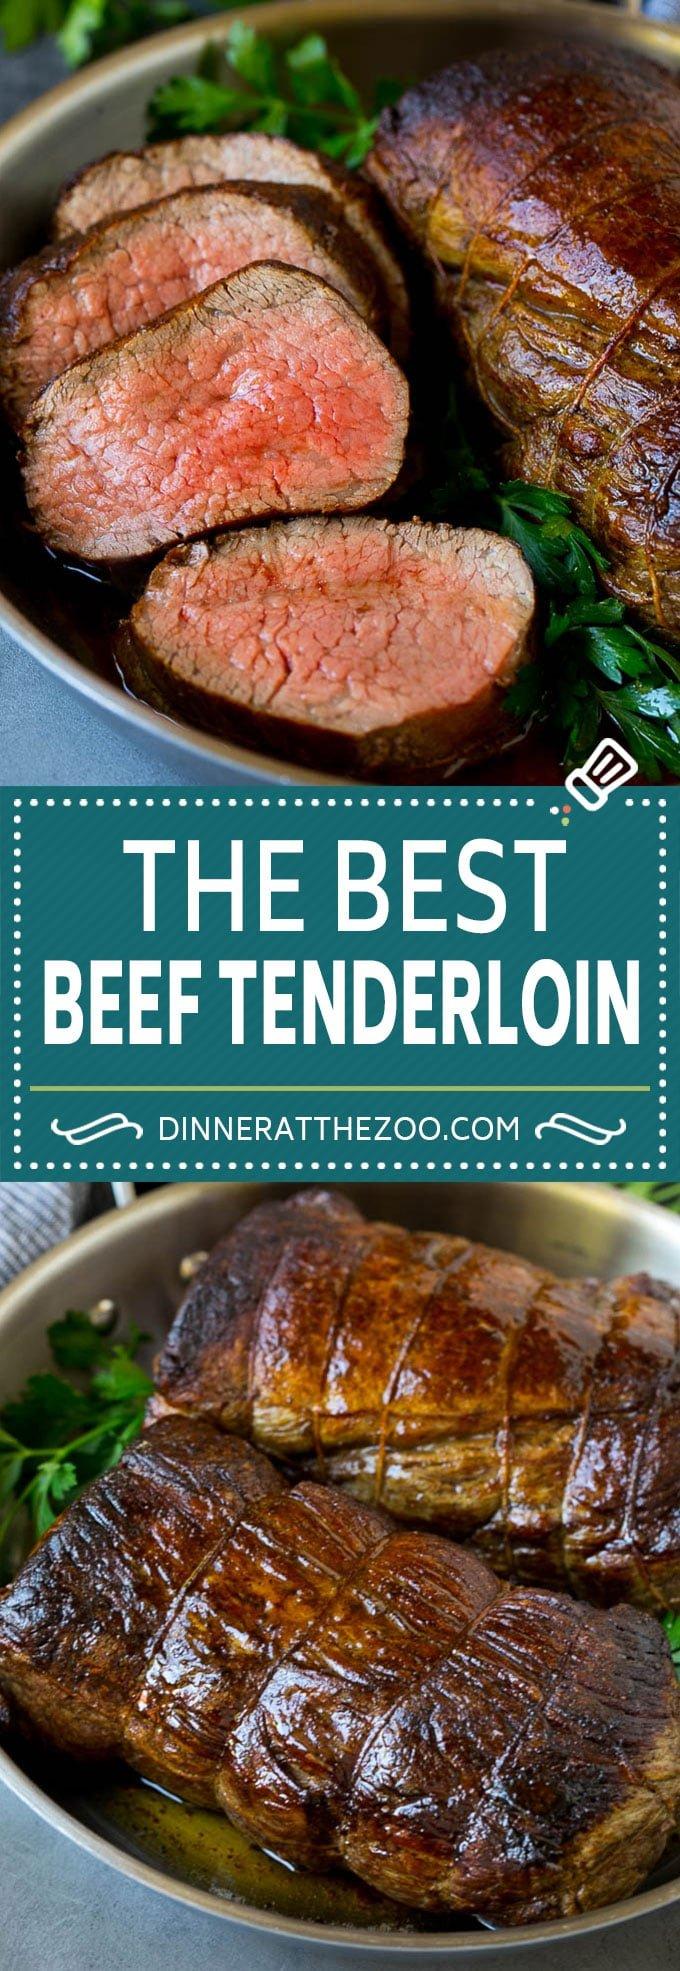 Beef Tenderloin with Garlic Butter #beef #steak #dinner #dinneratthezoo